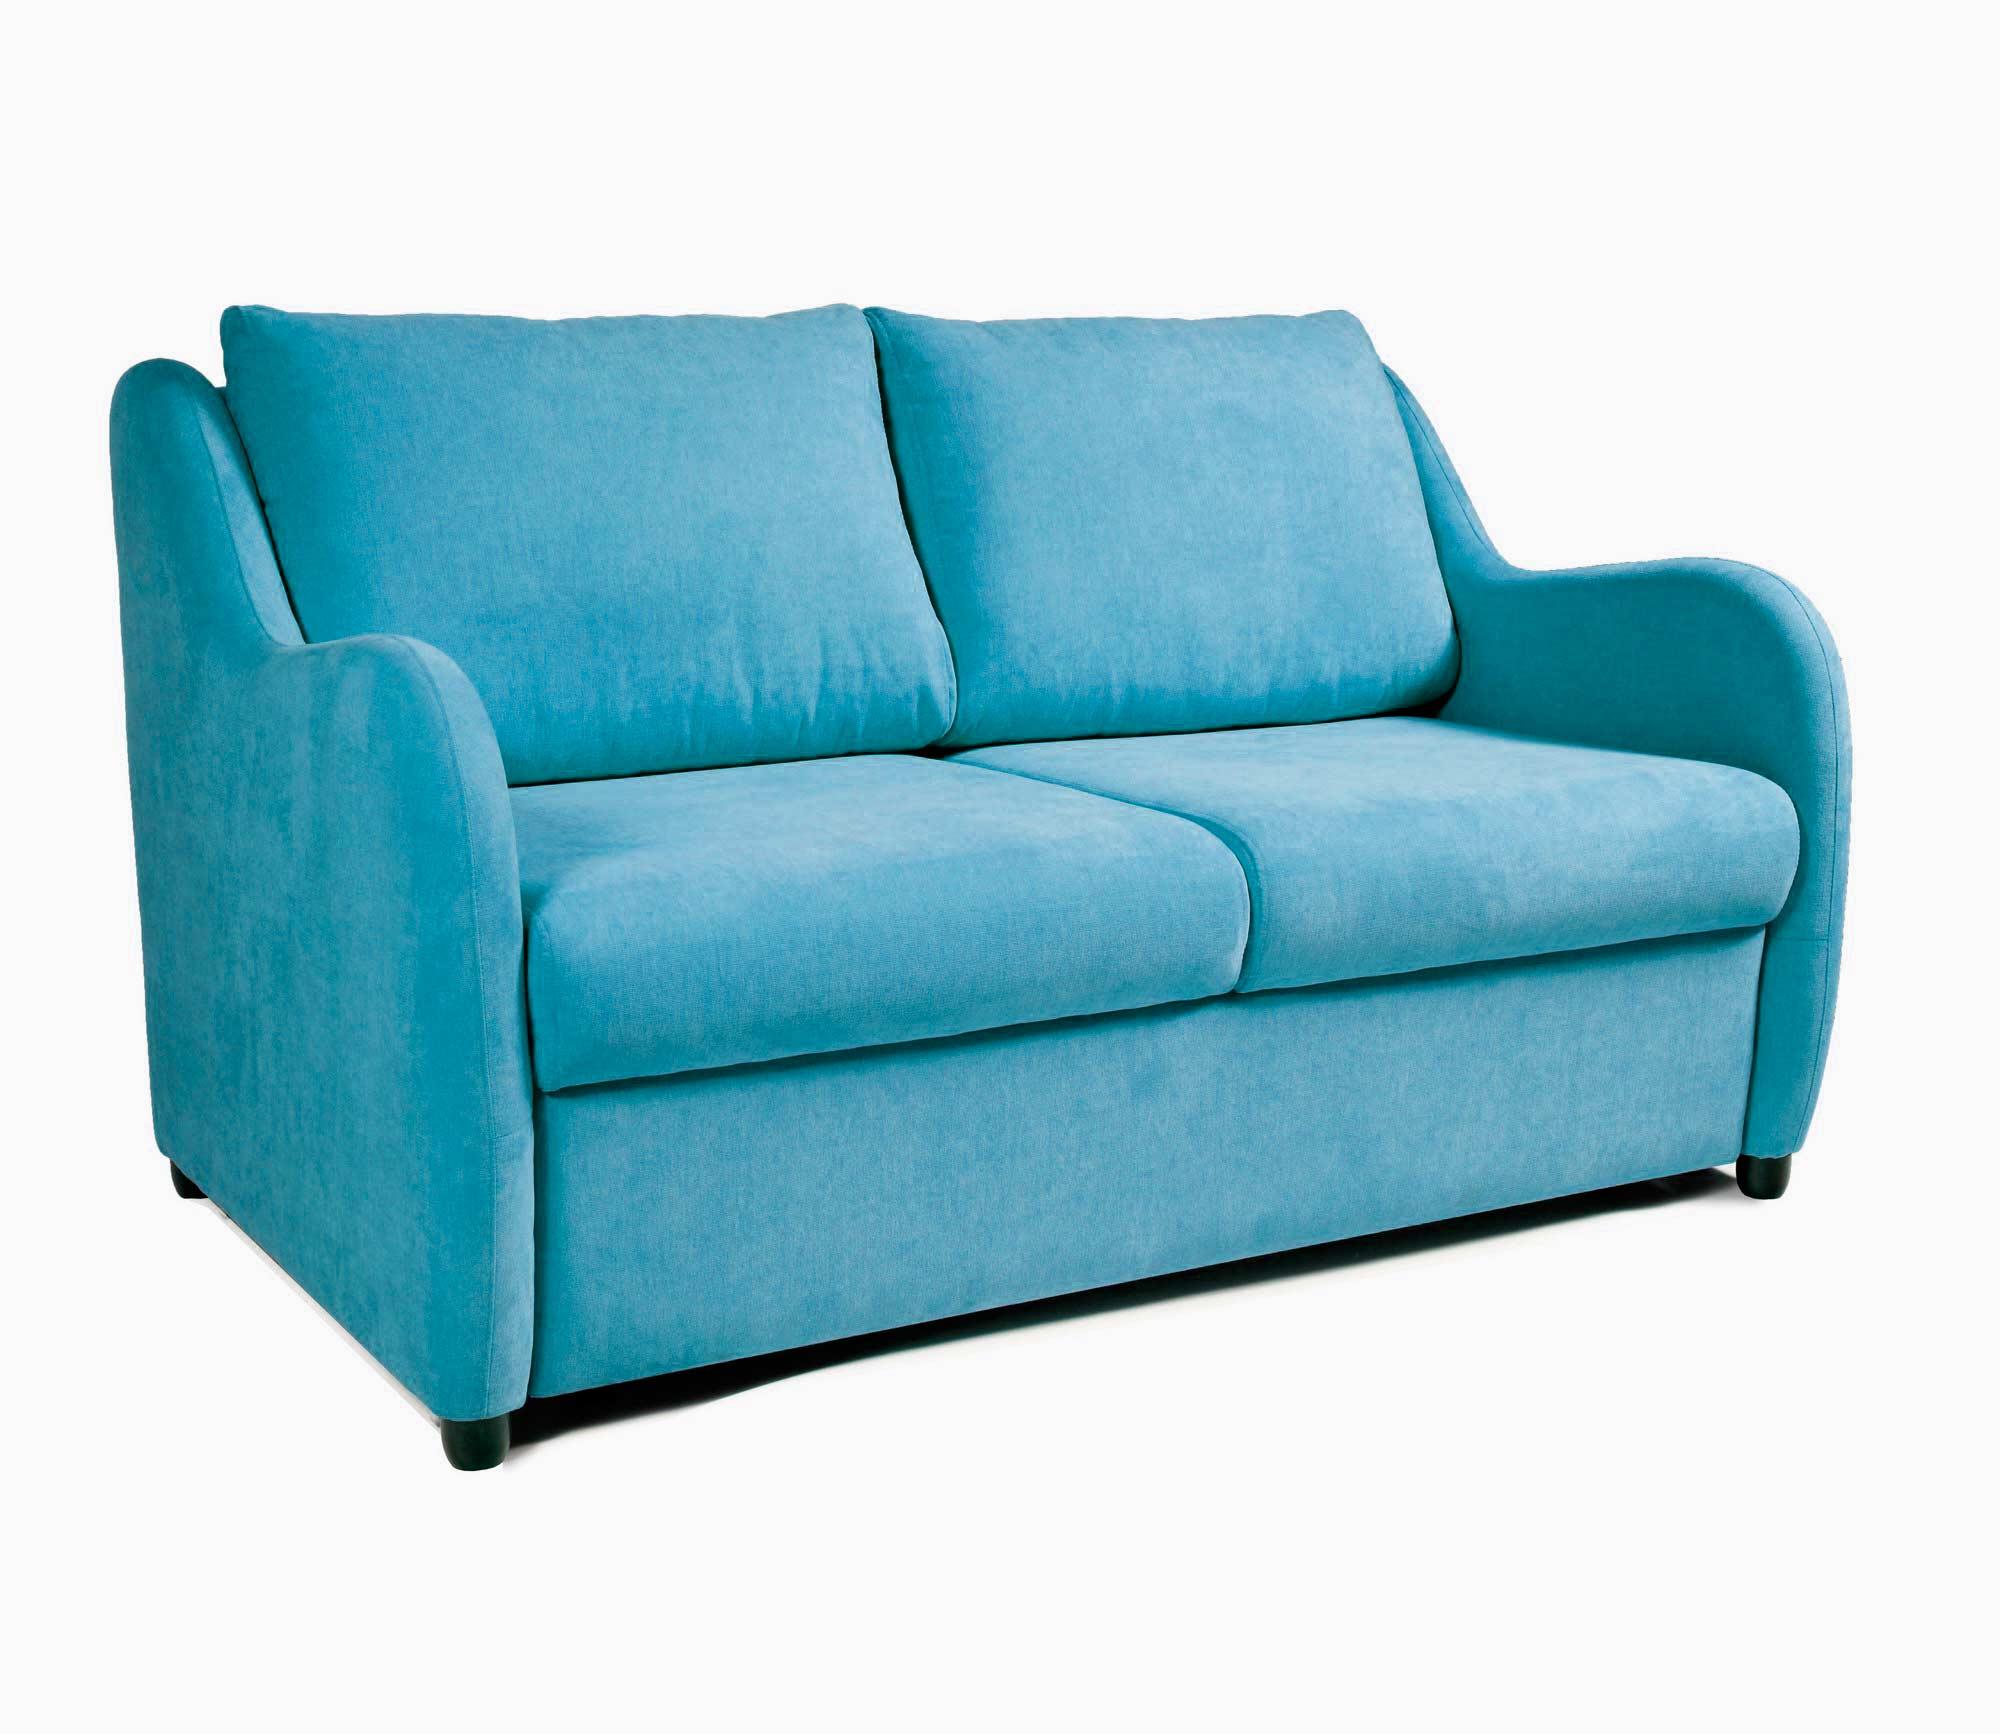 Myfurnish диван-кровать universal голубой  38514/7